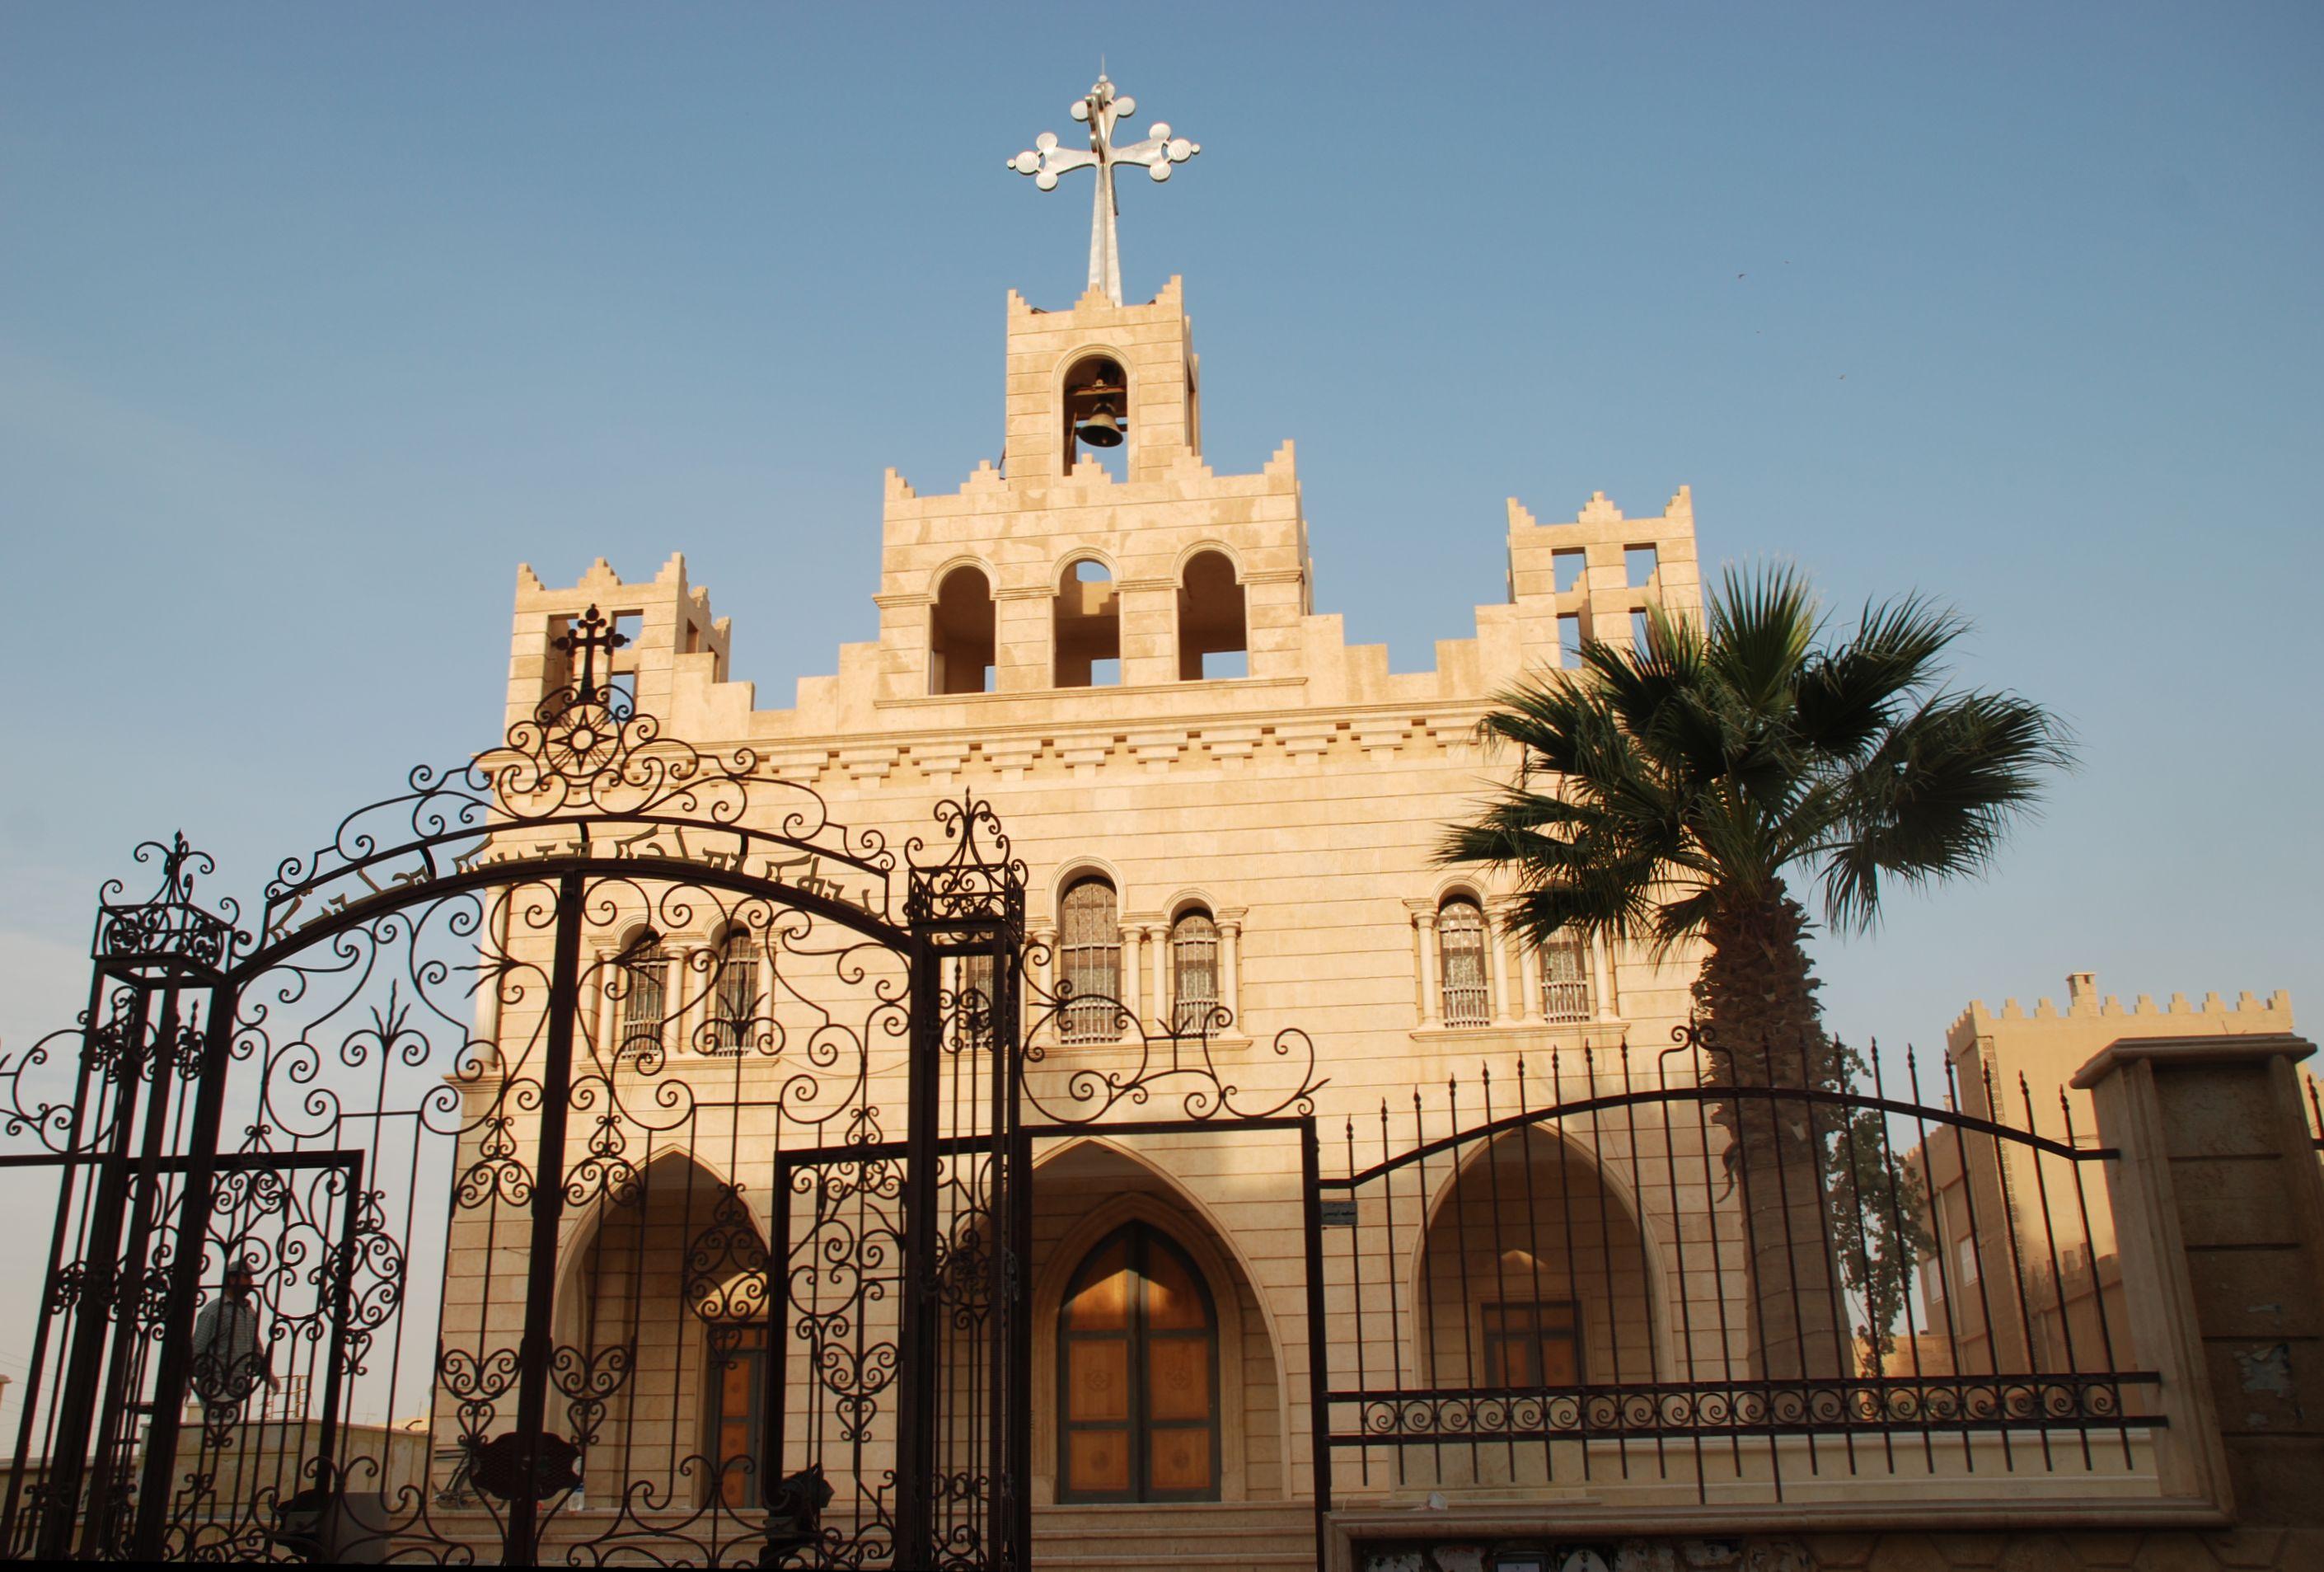 File:Chaldean Catholic Church, Al-Hasakah, Syria.jpg